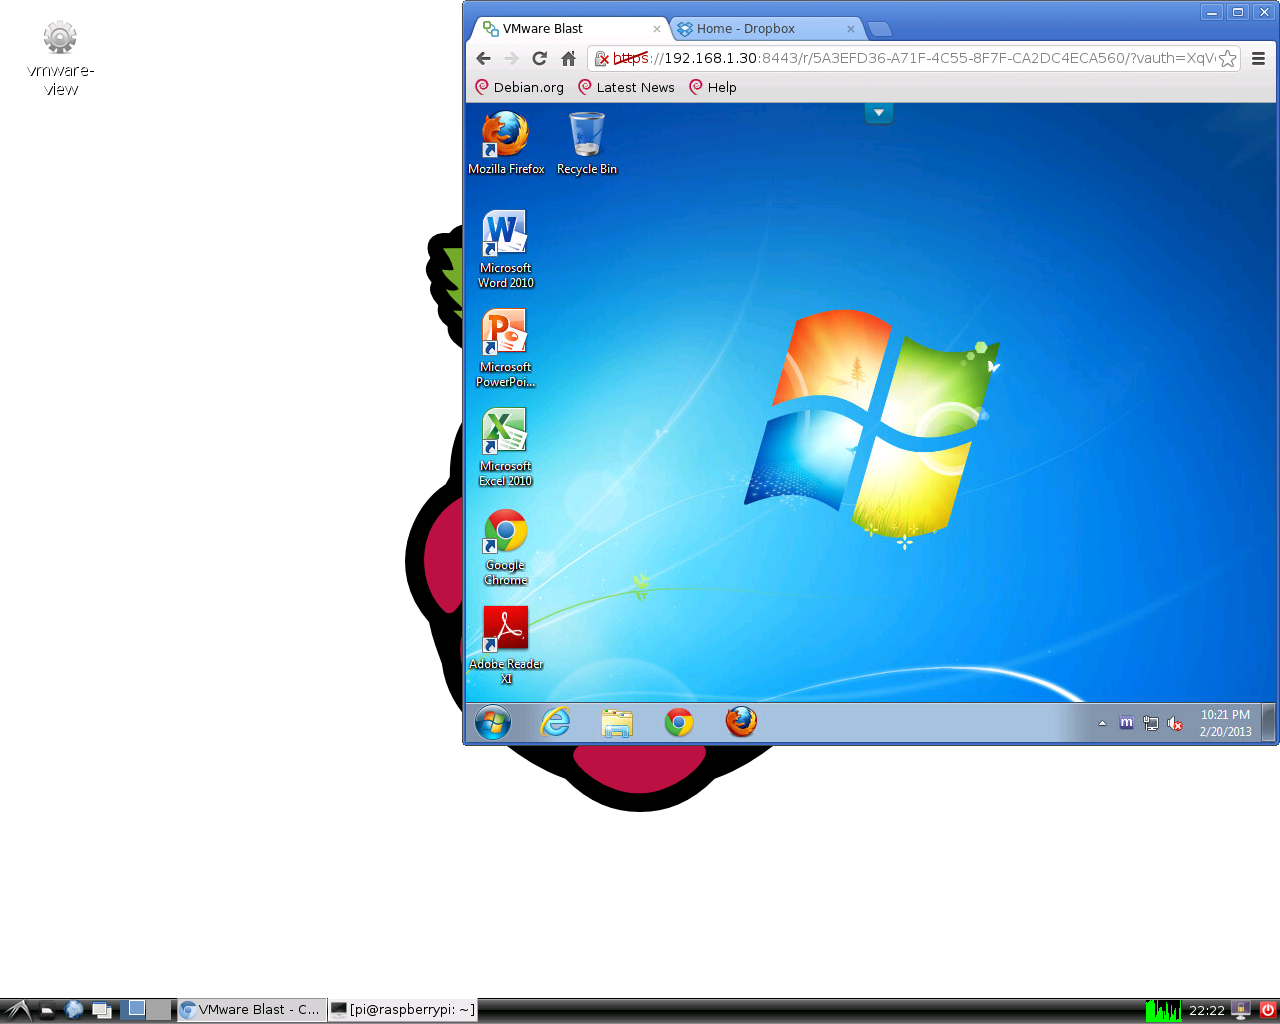 Raspberry Pi as a Horizon View Client | Virtual Thoughts